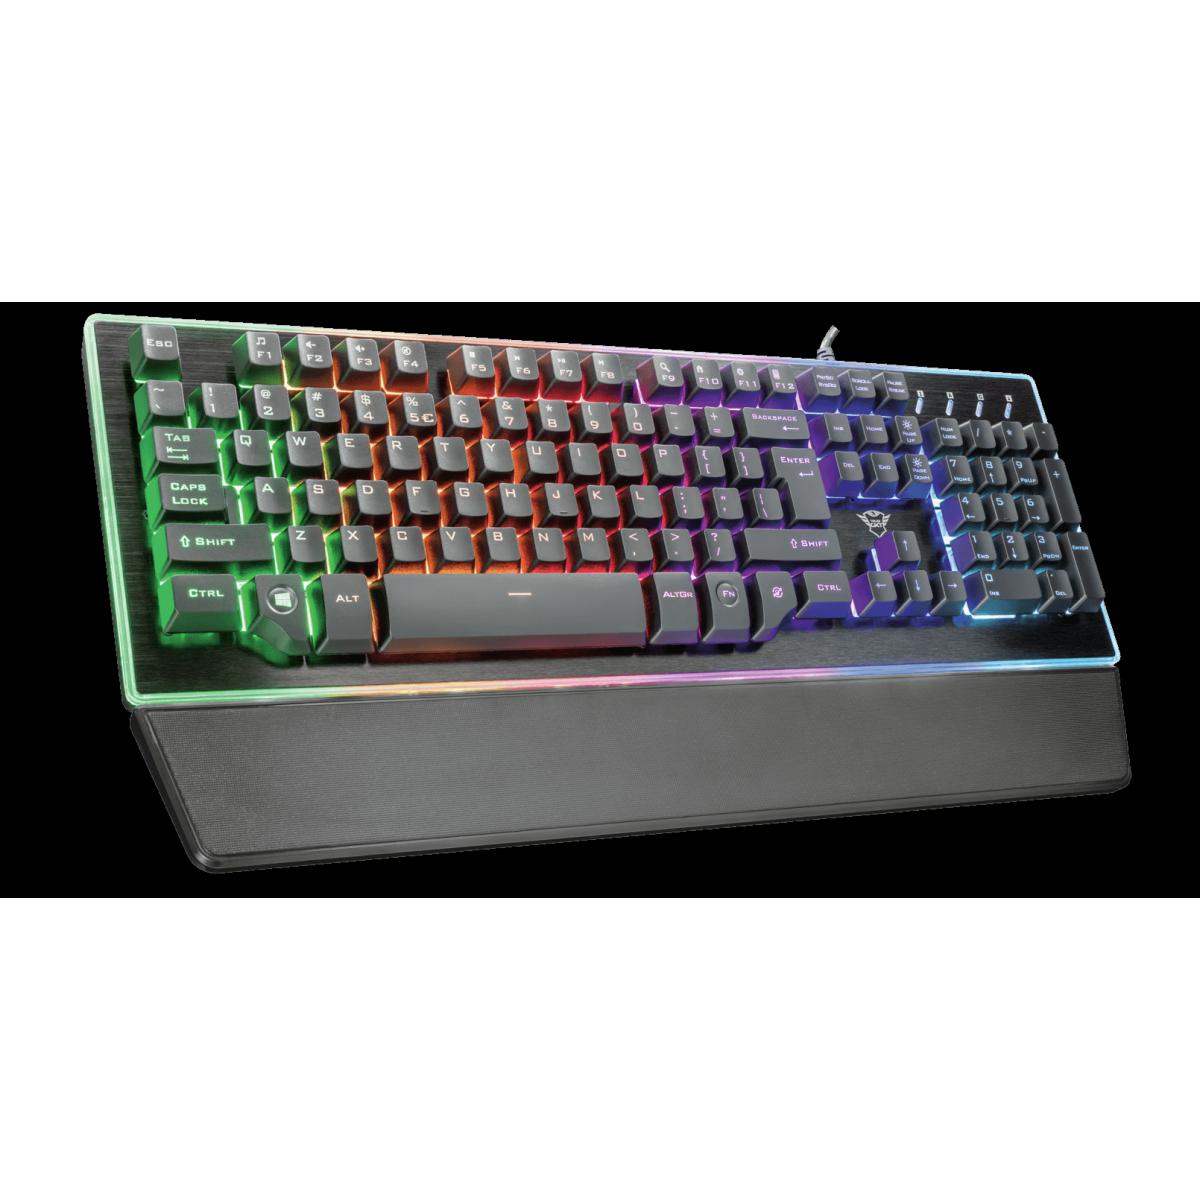 Teclado GamerTrustThura, Semi-Mecanico, RGB, USA, GXT860